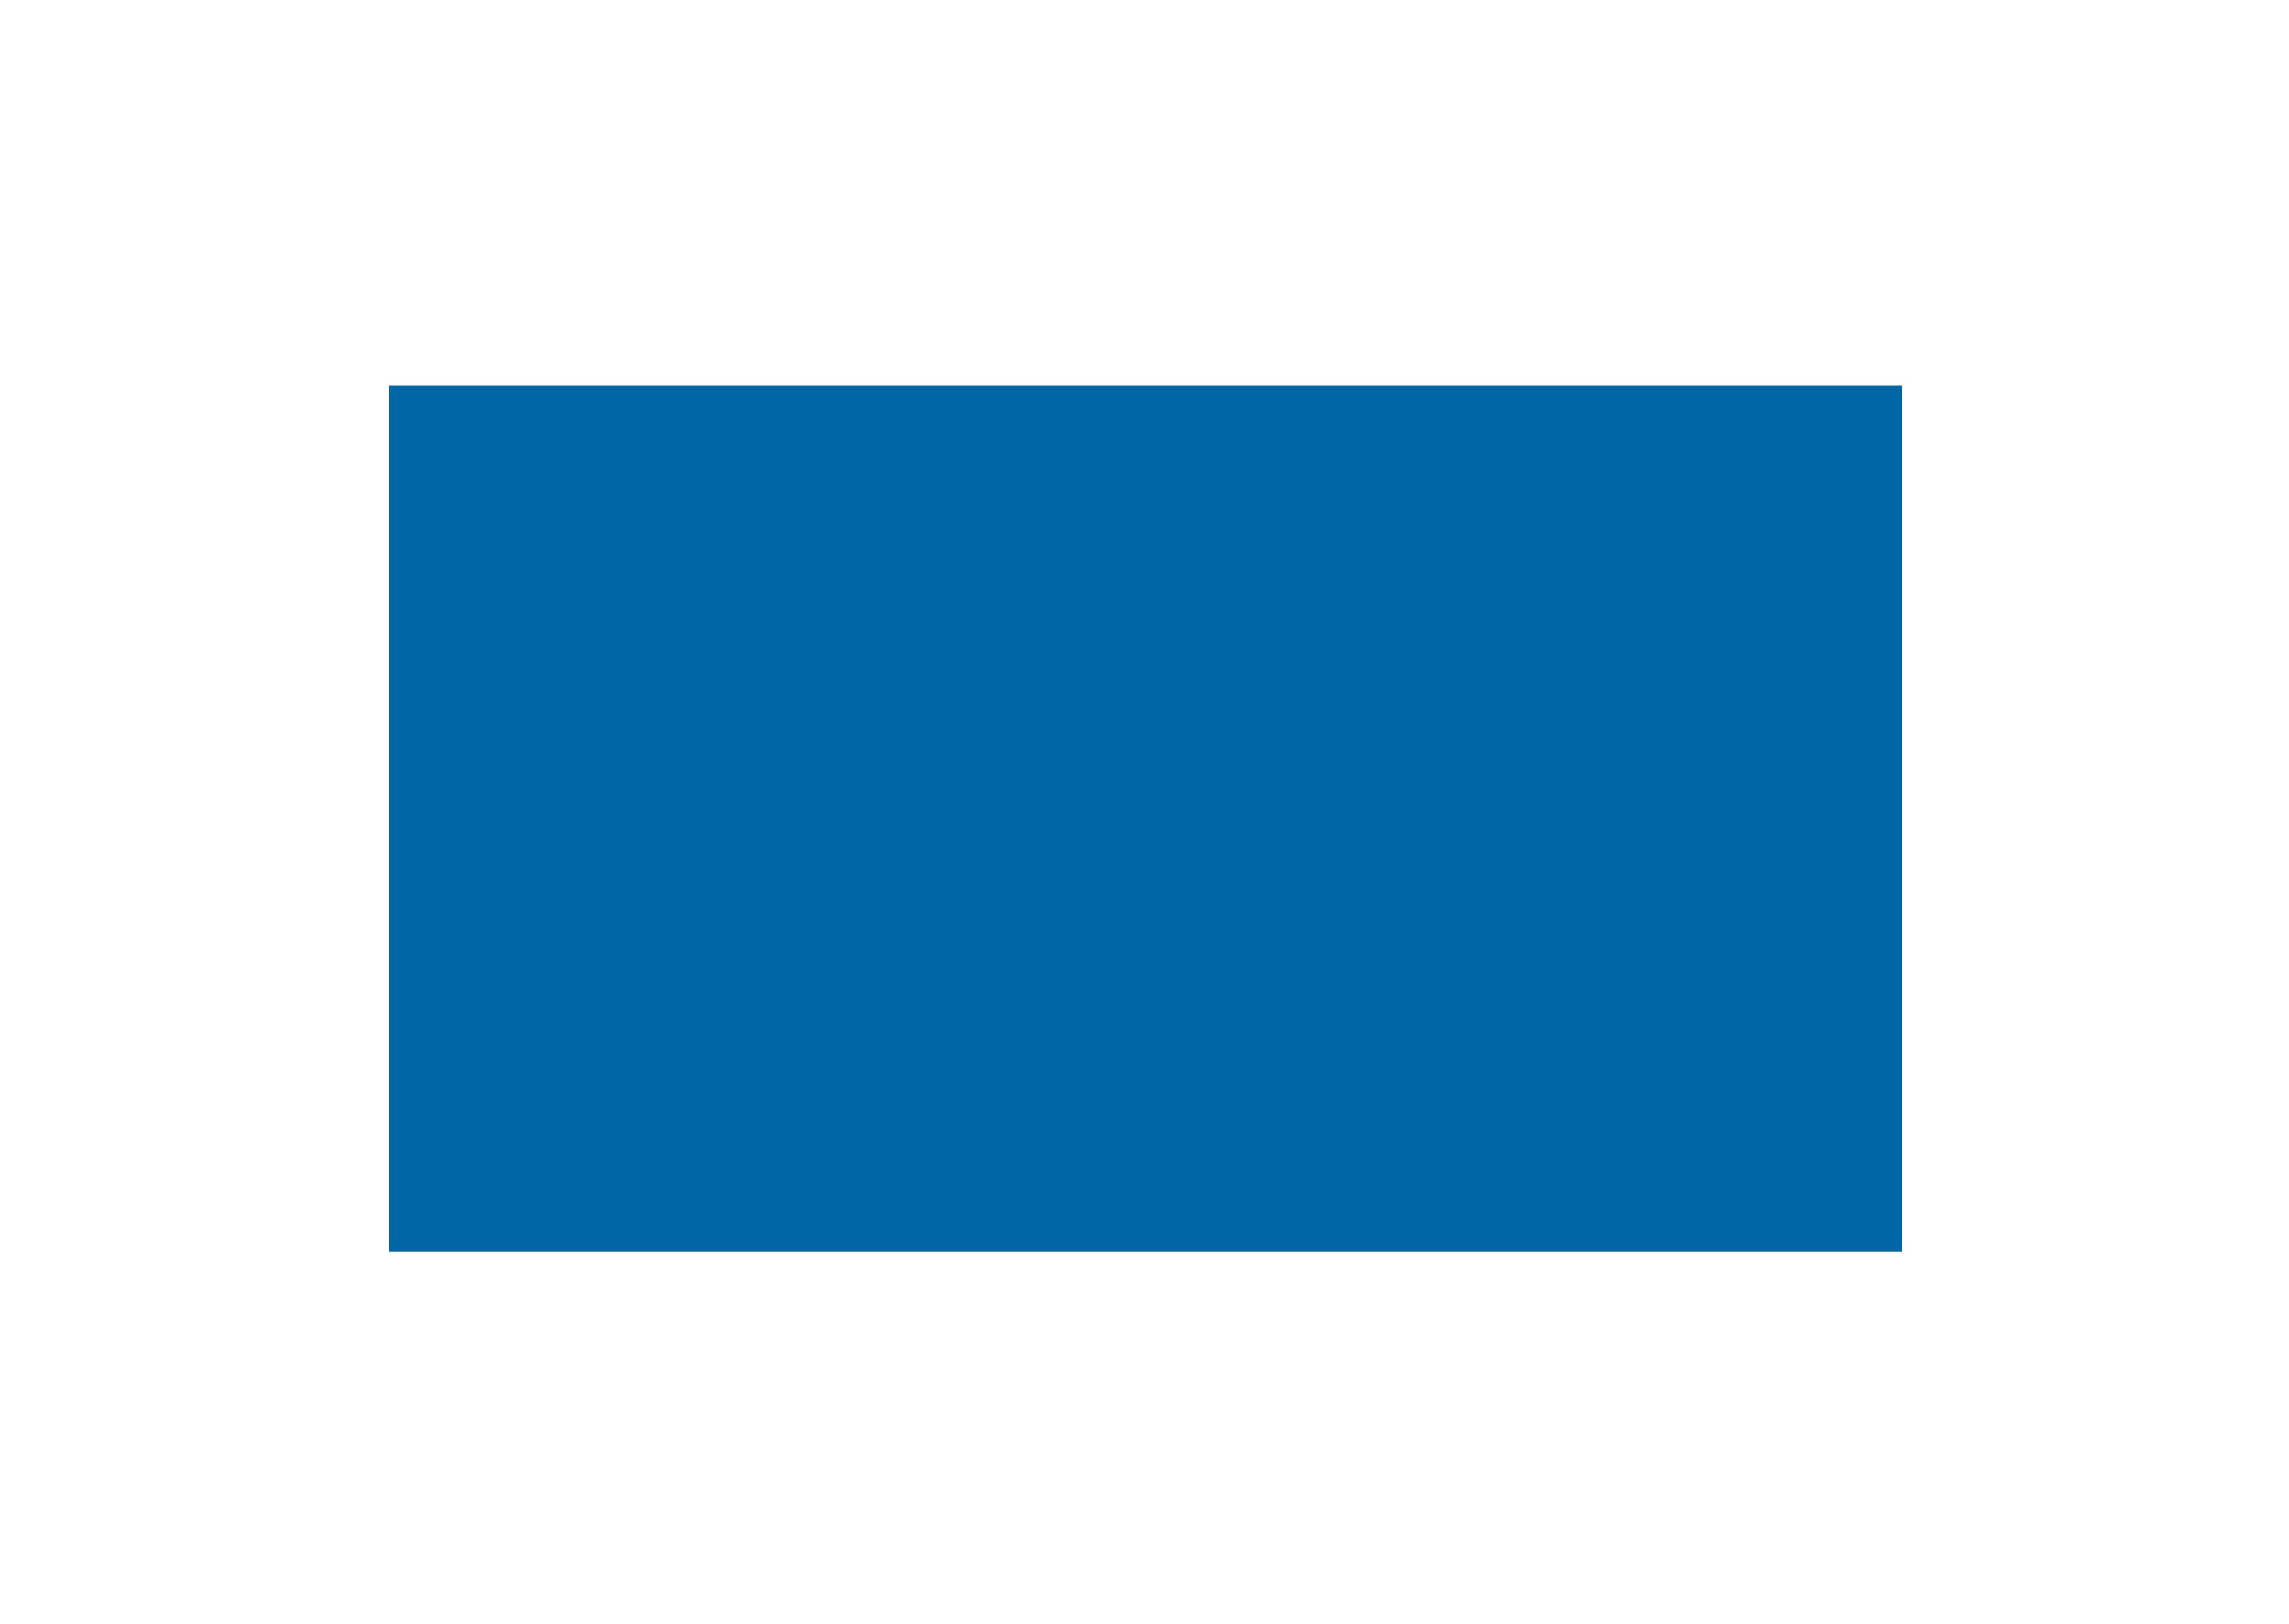 FWD50 Sponsor - Bell